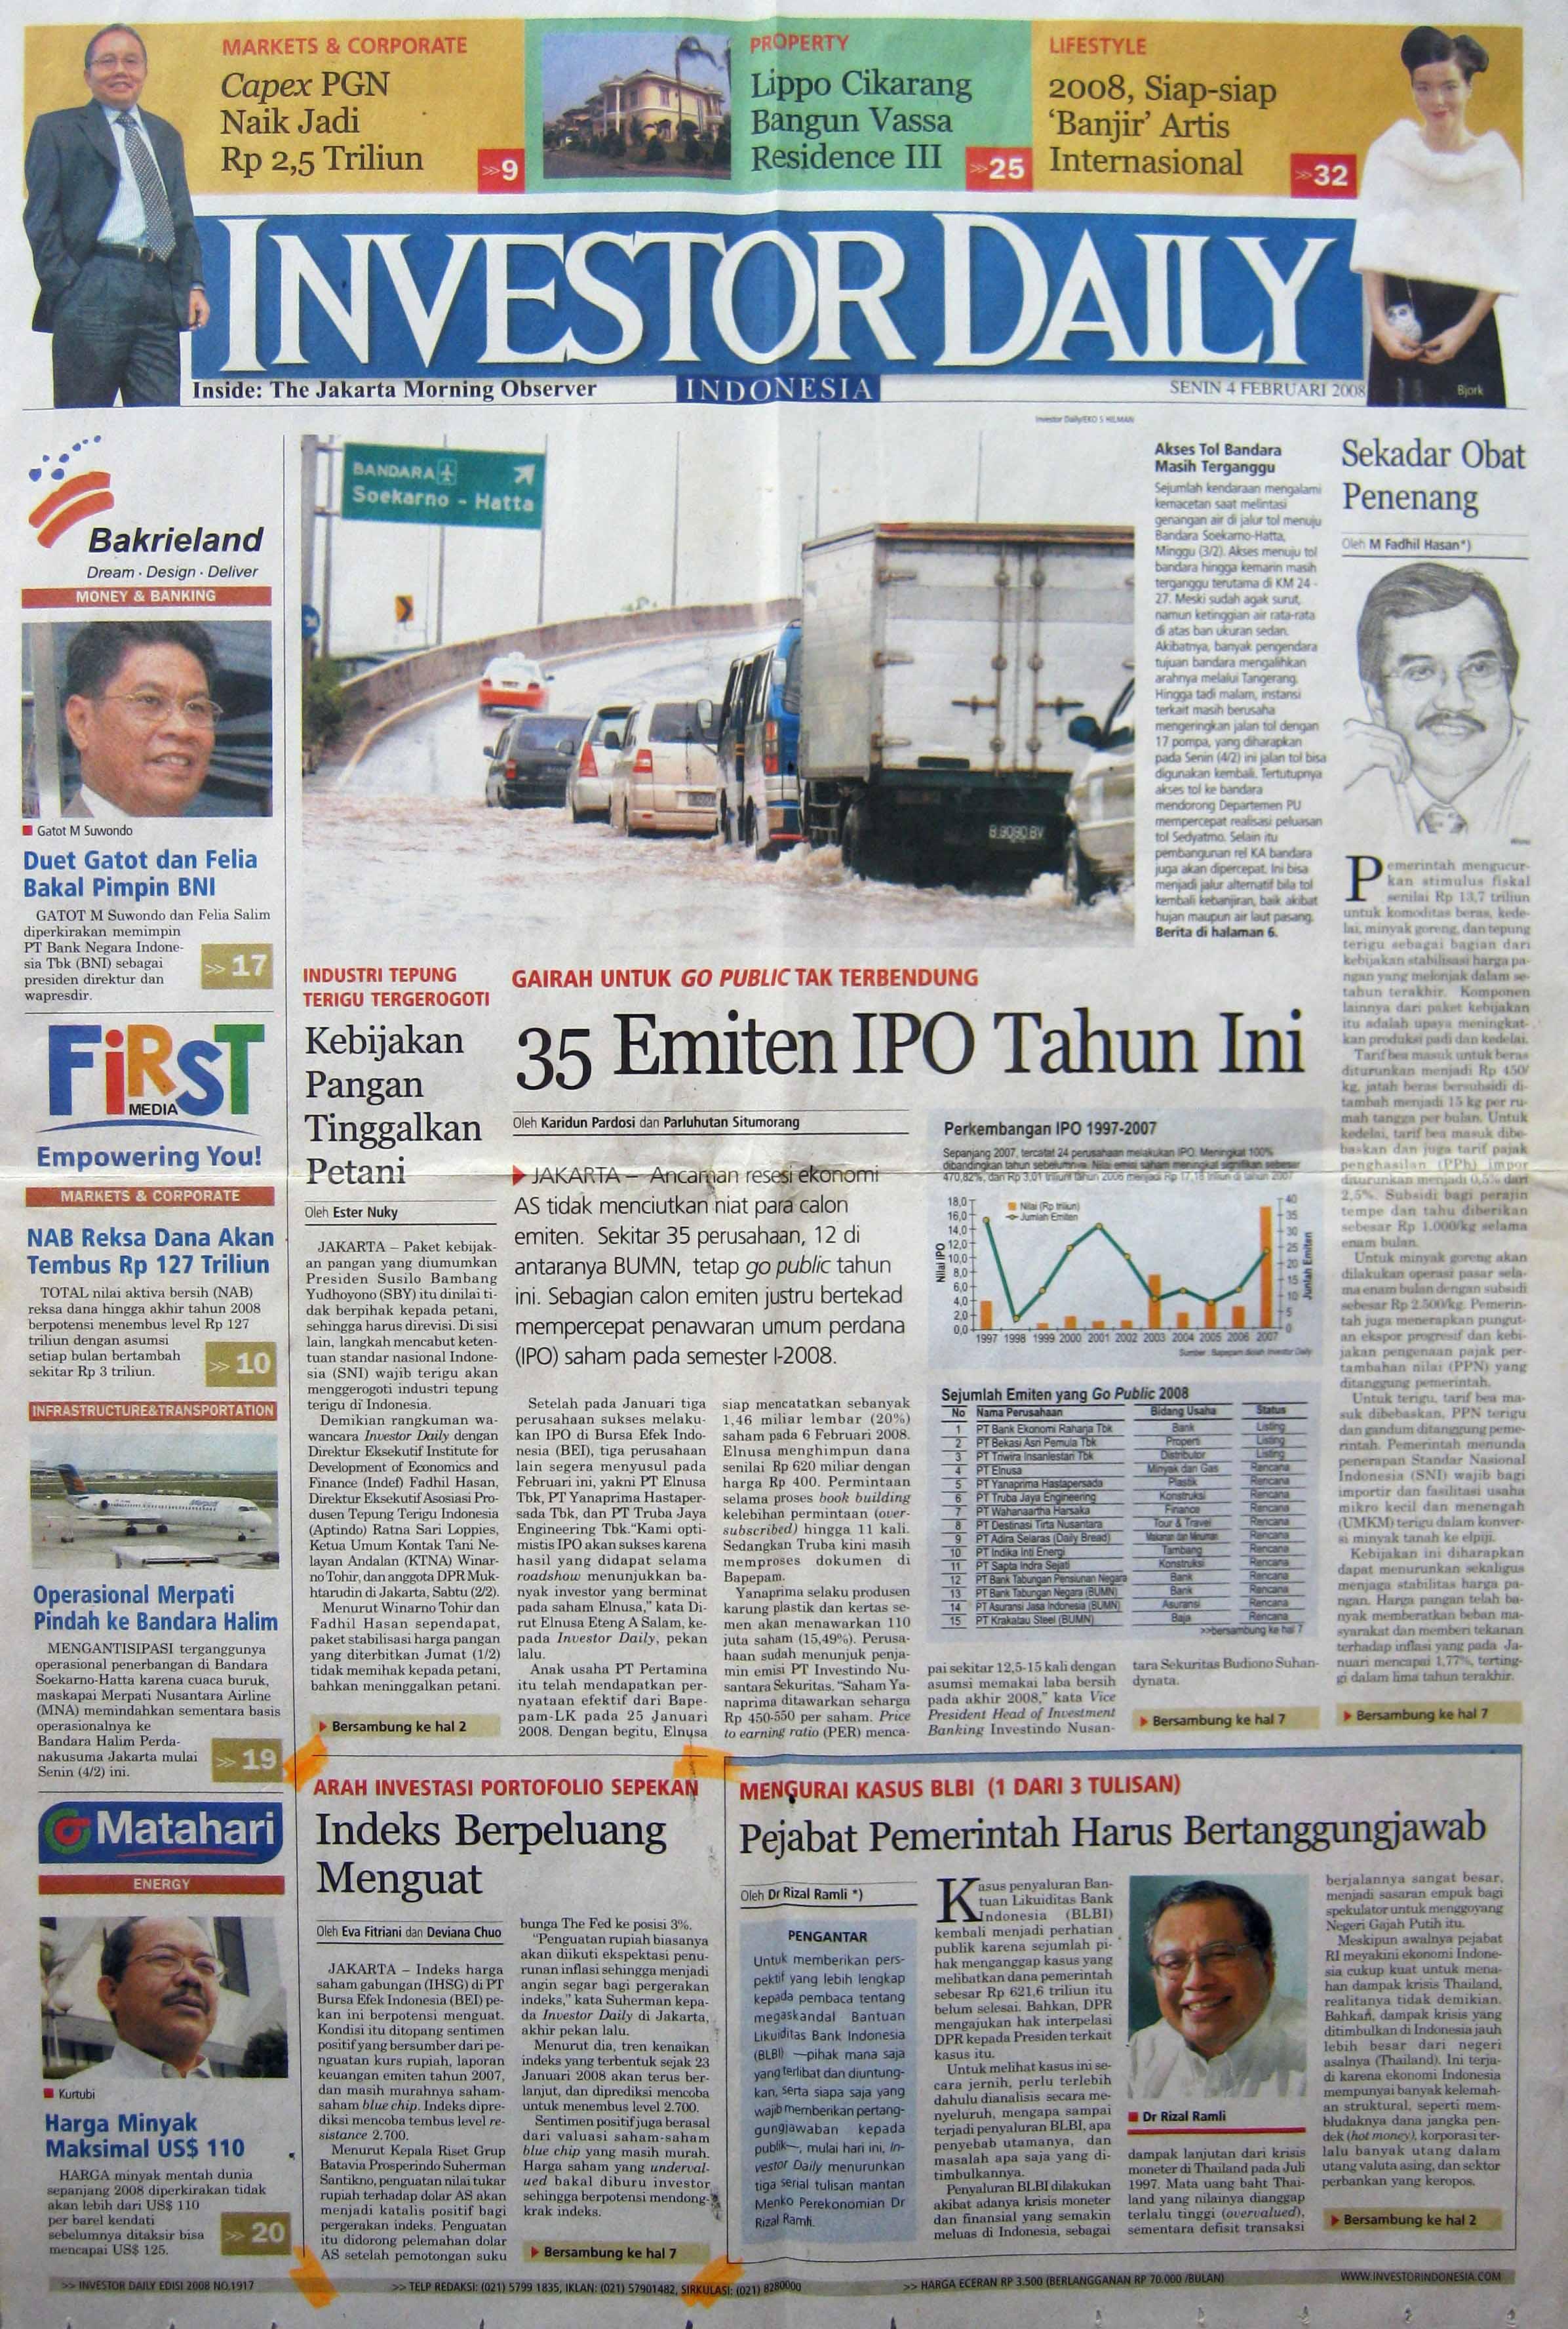 14. 04 Februari 2008 - Indeks Berpeluang Menguat